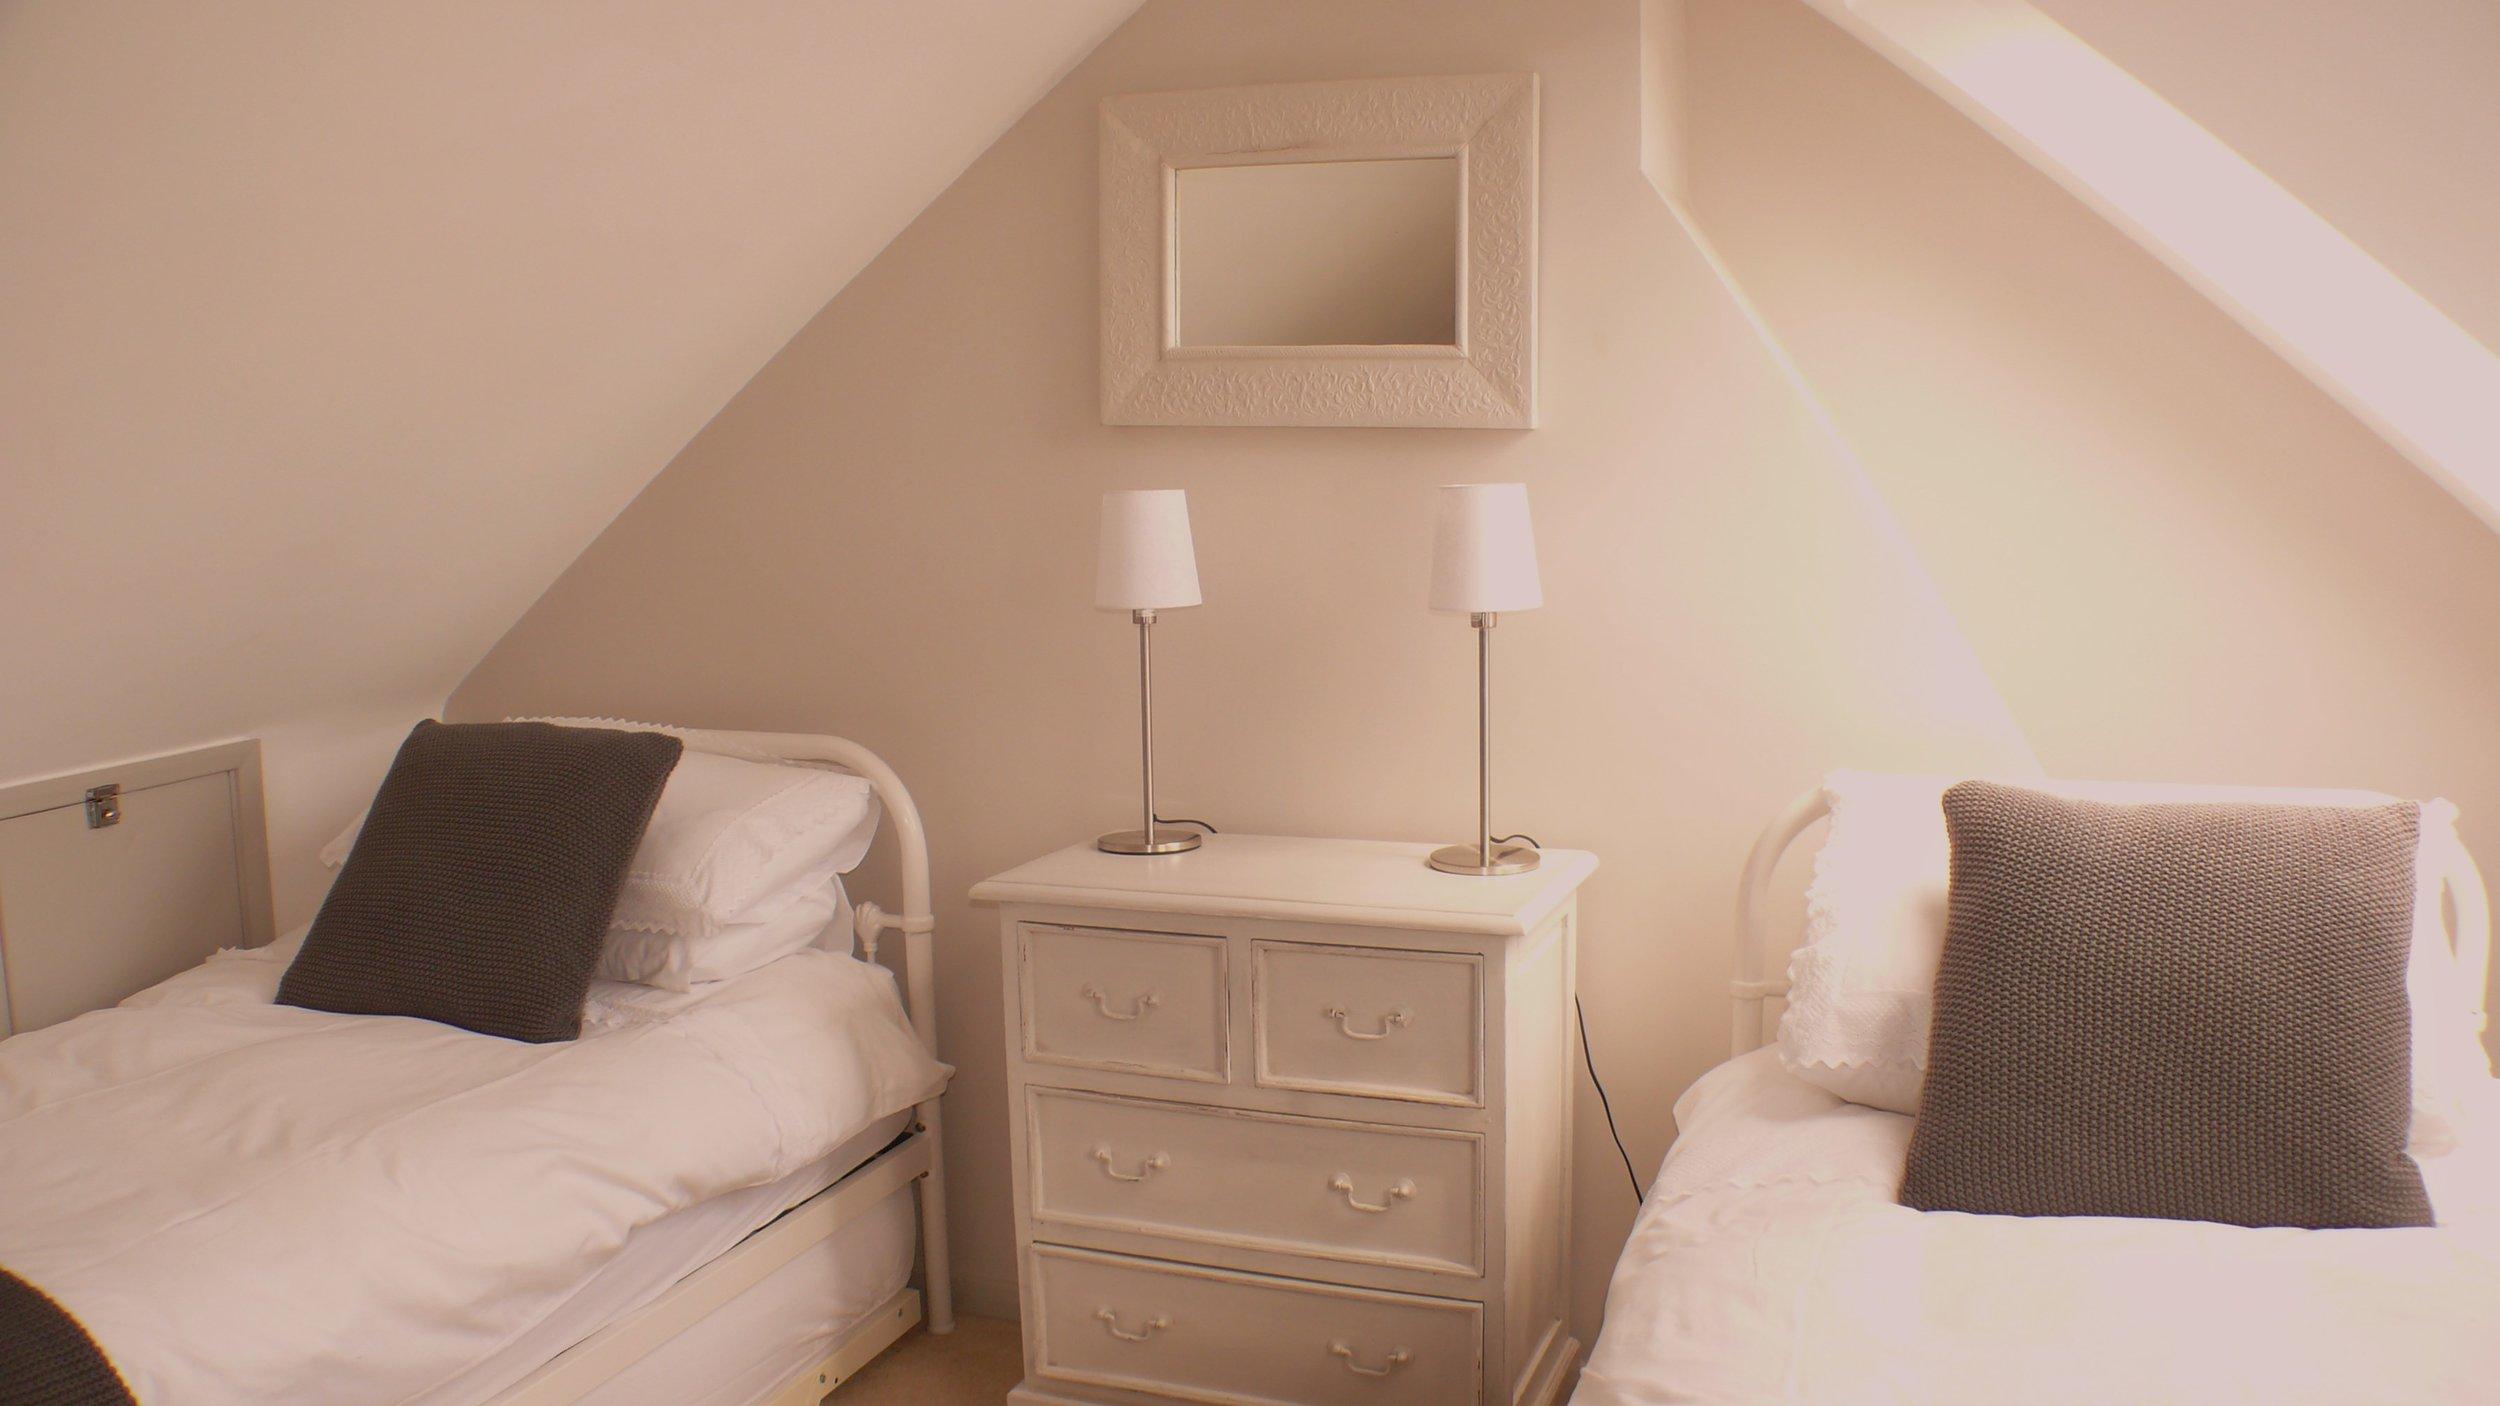 Bub+bedroom+3.jpg